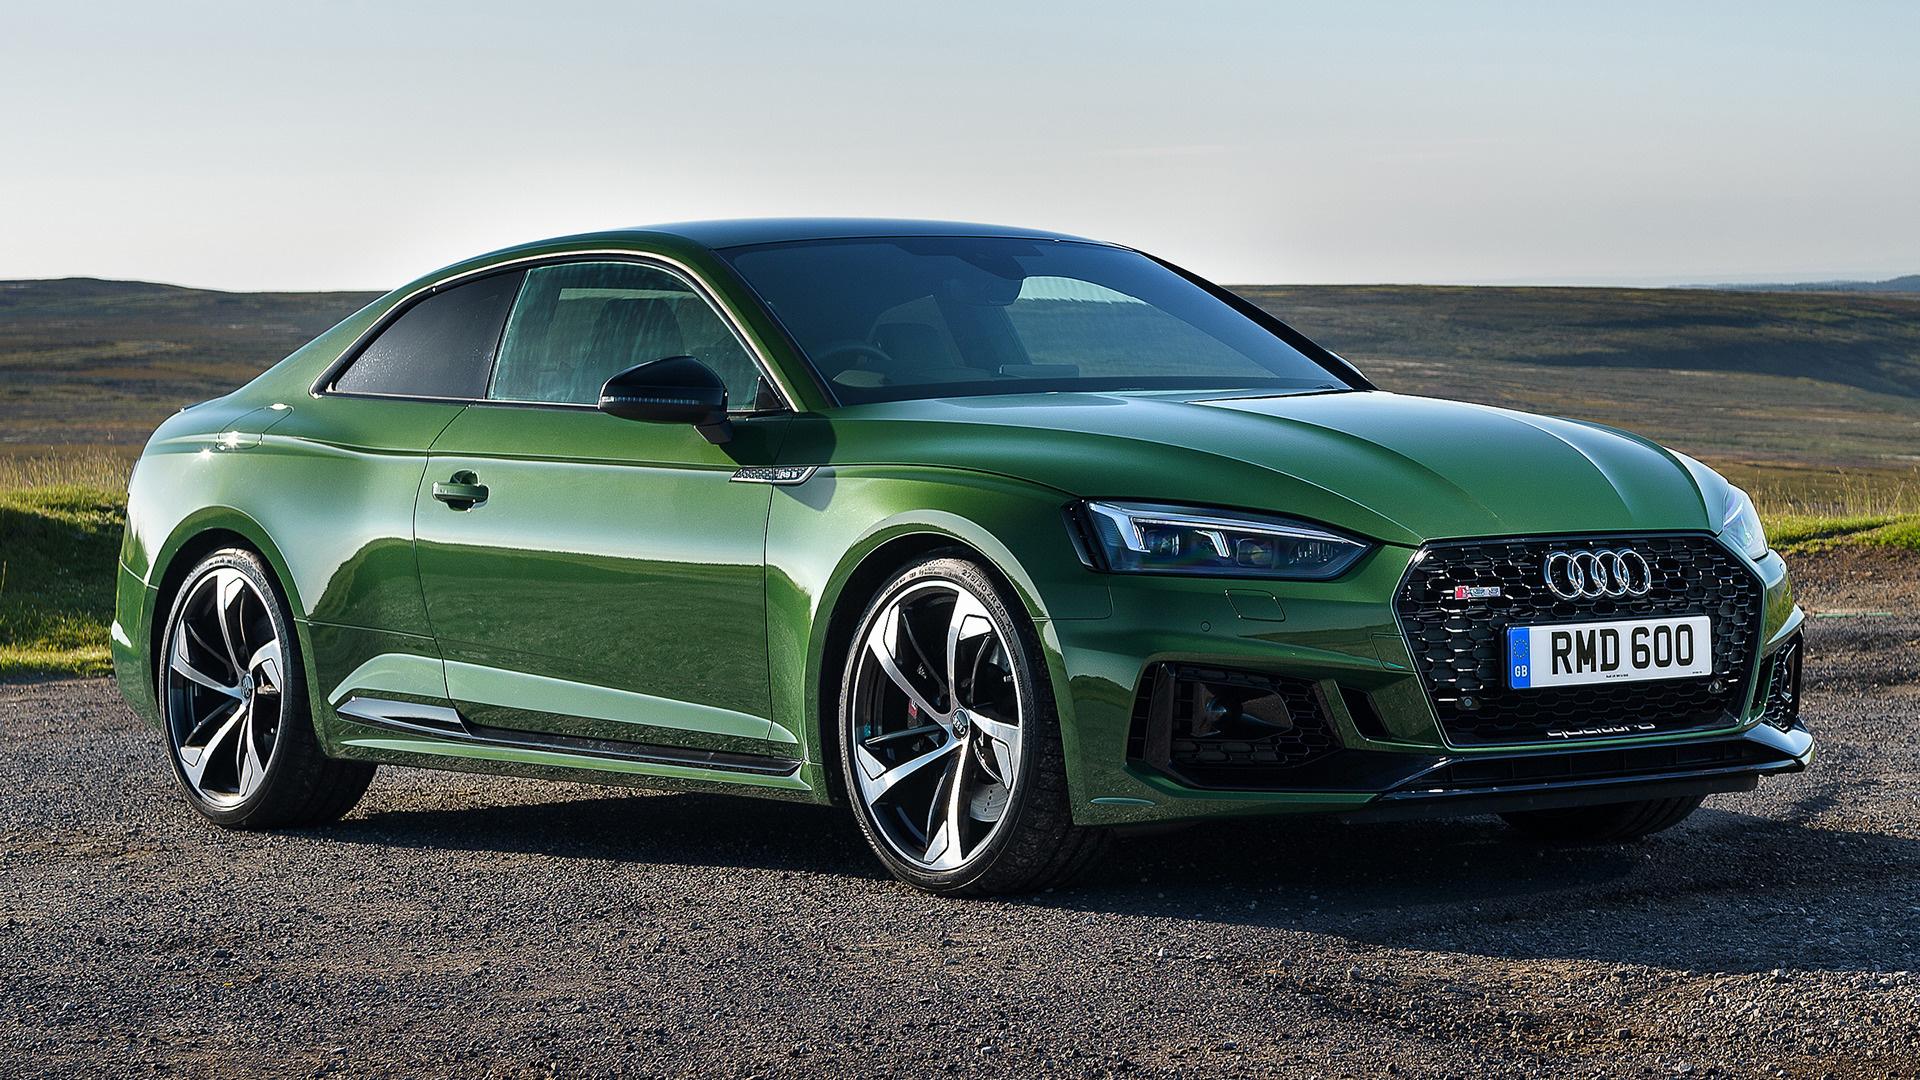 Wallpaperswide Audi Hd Desktop For 4k Ultra Hd Tv Wallpapers